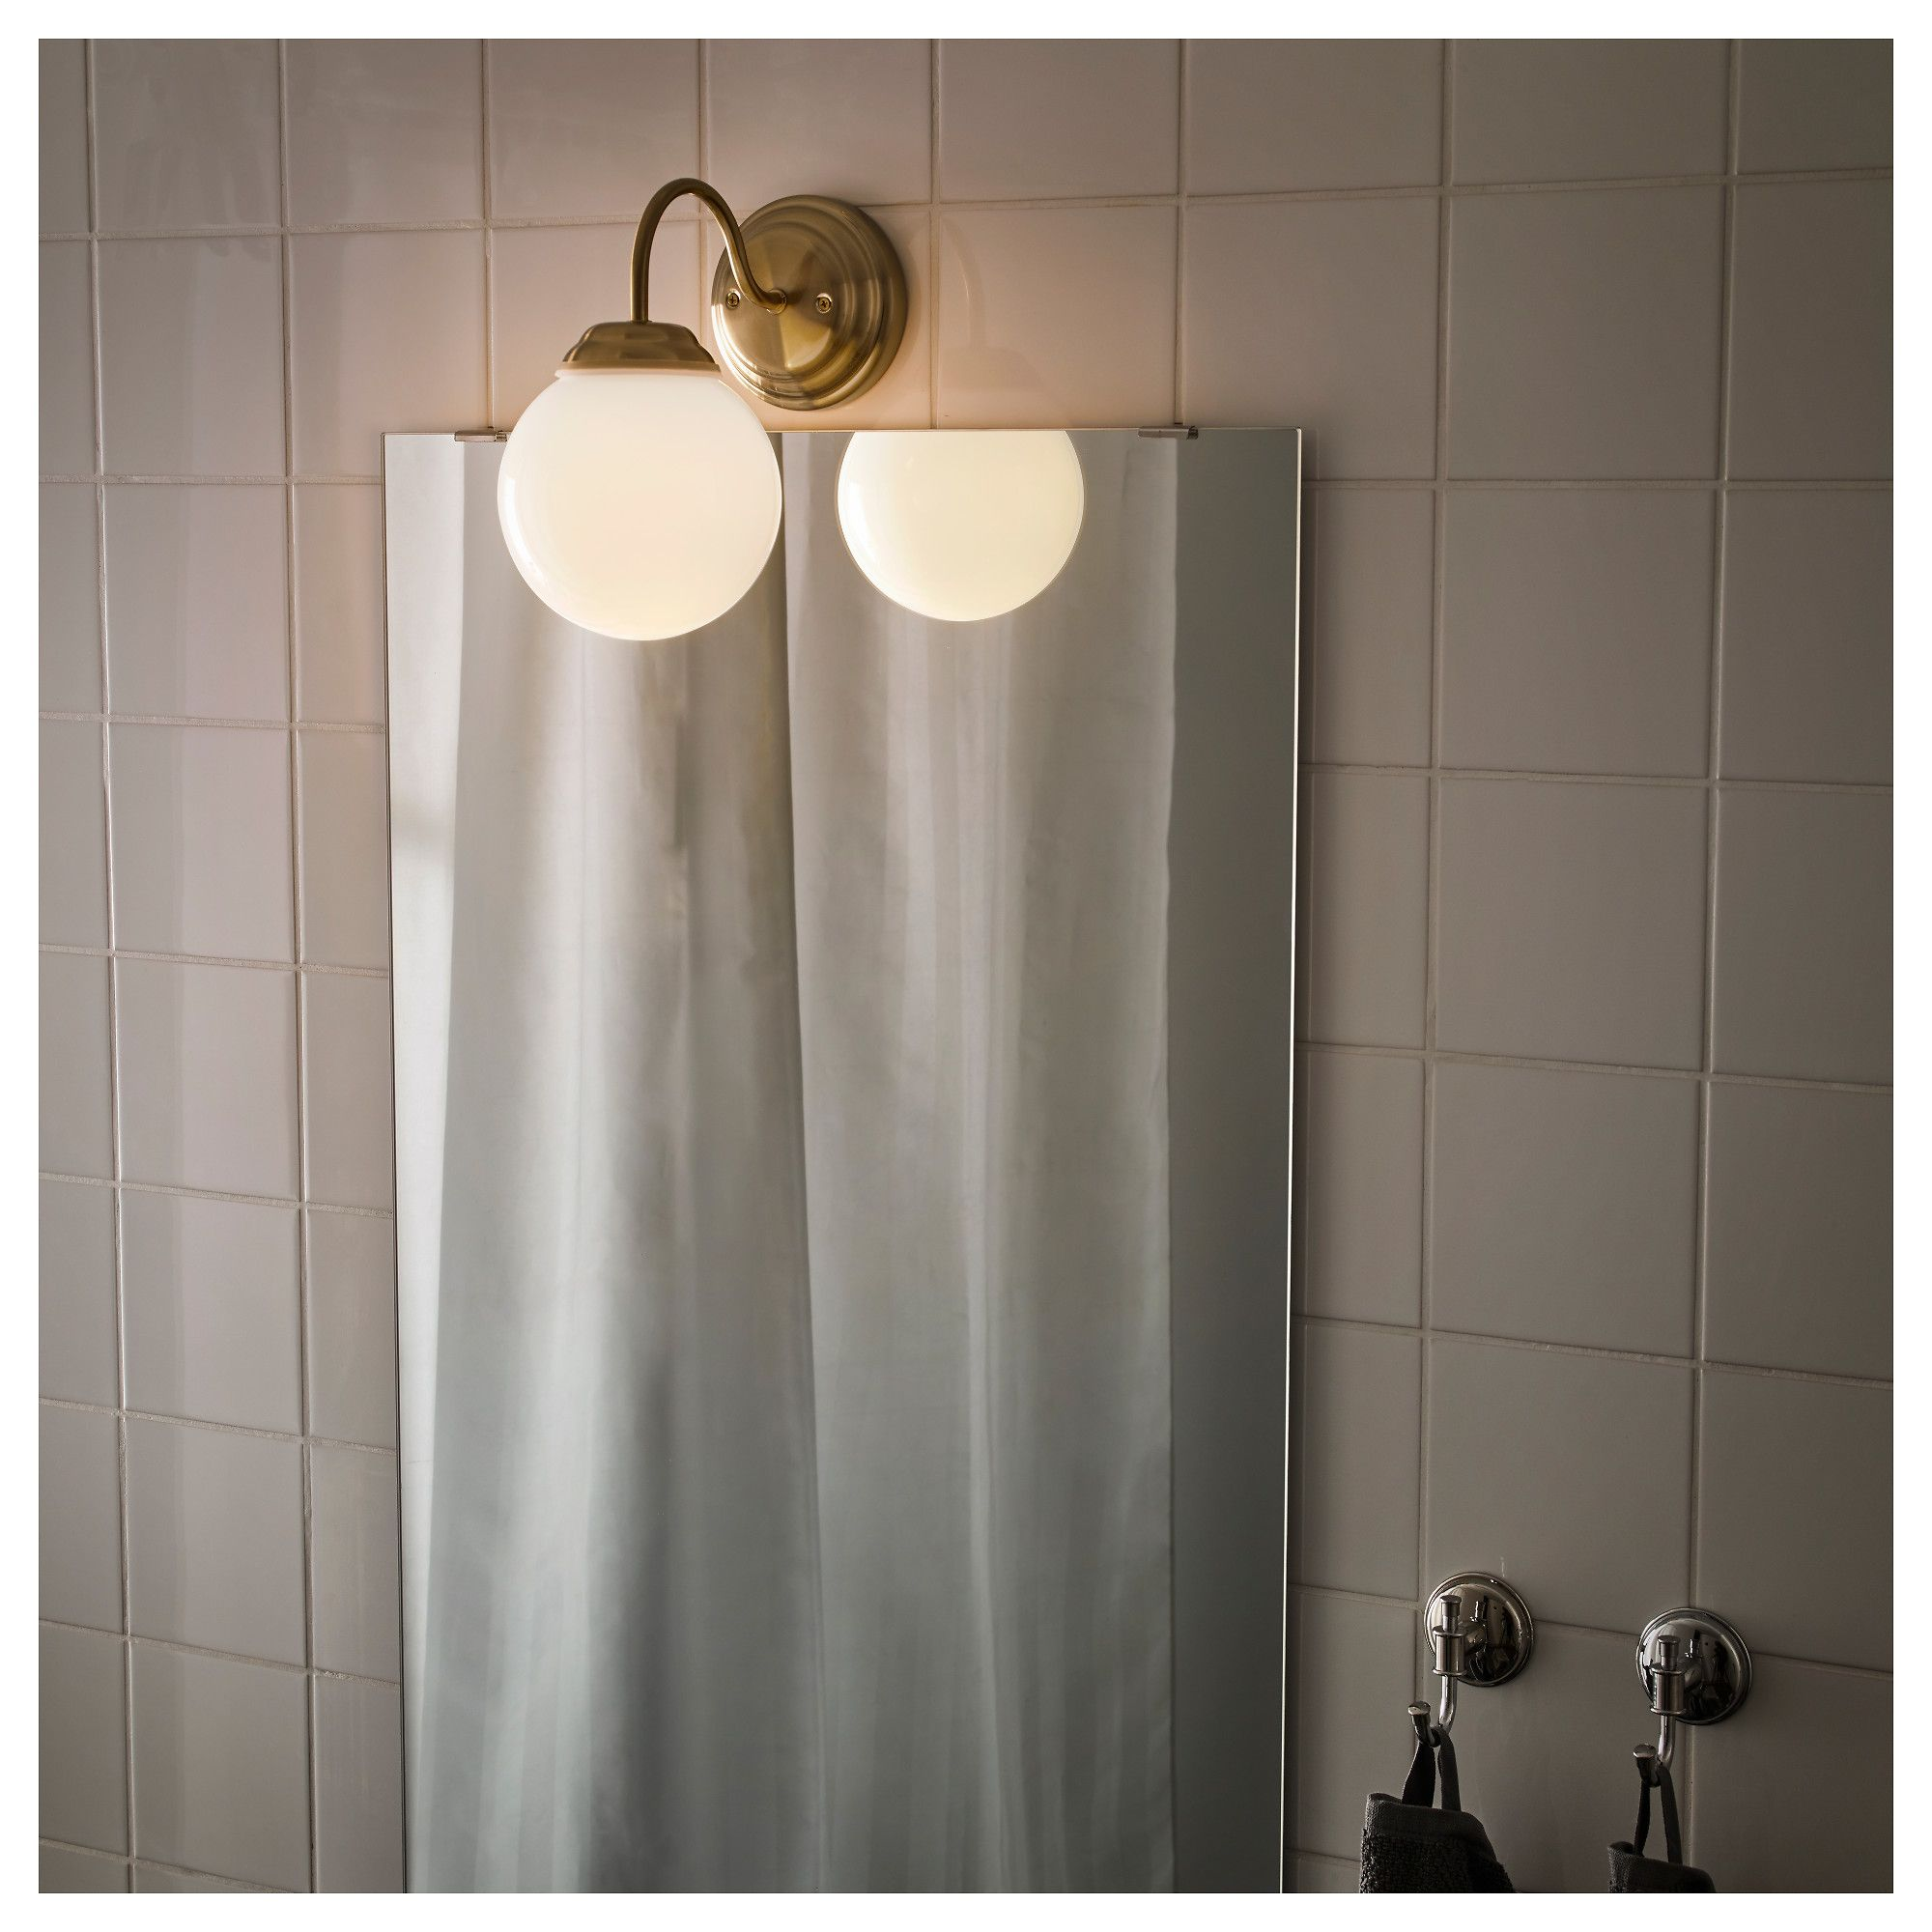 Ikea Lillholmen Wall Lamp Br Color